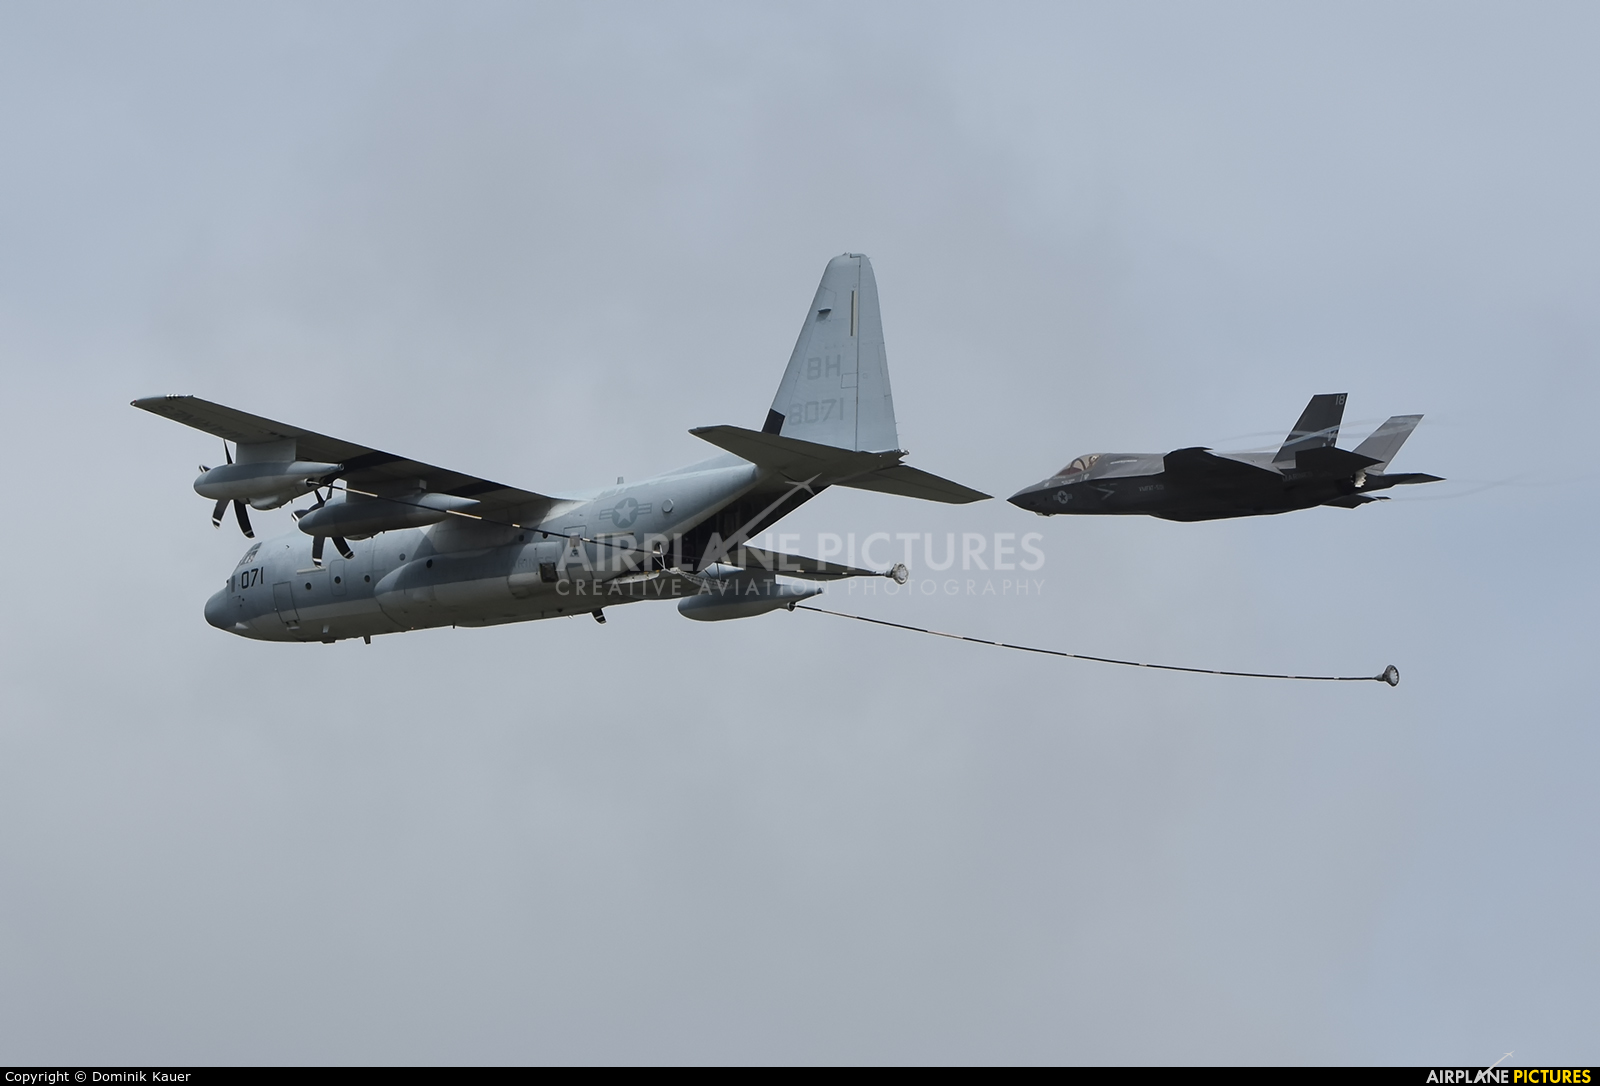 USA - Marine Corps 168071 aircraft at Fairford